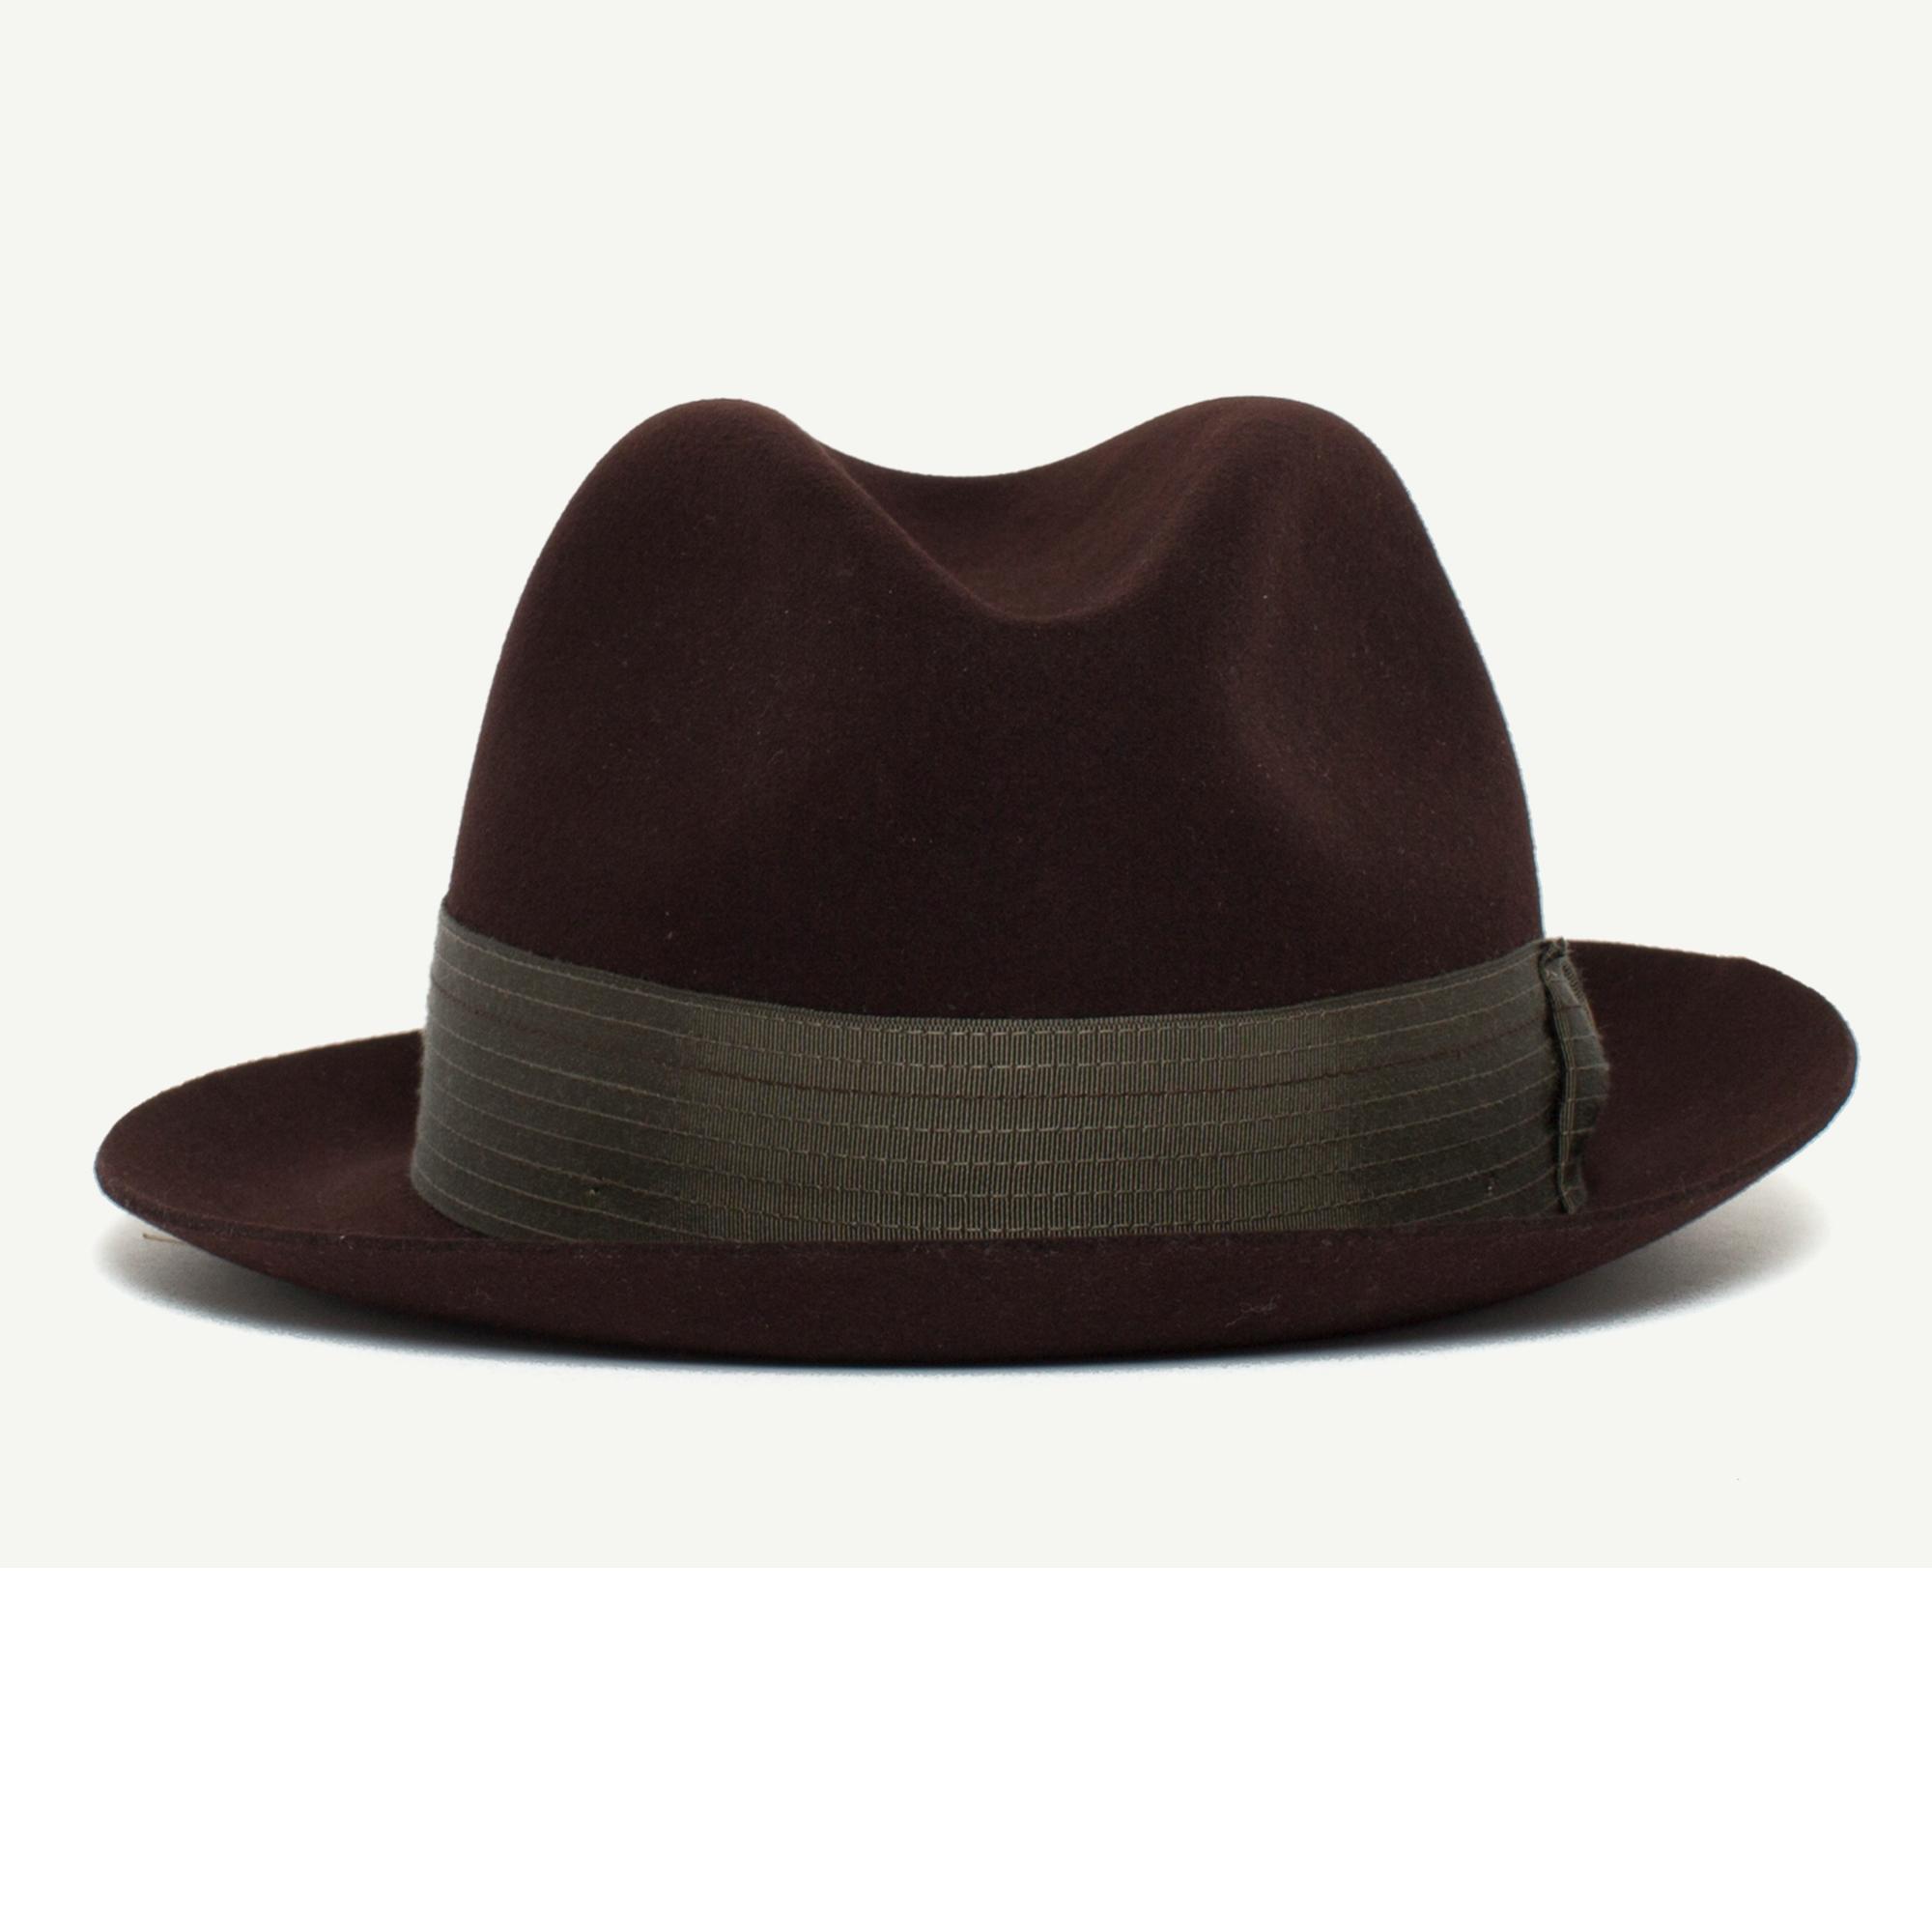 Big Lou Burgundy felt Classic Brim Fedora hat front view  ffcb6a689c8